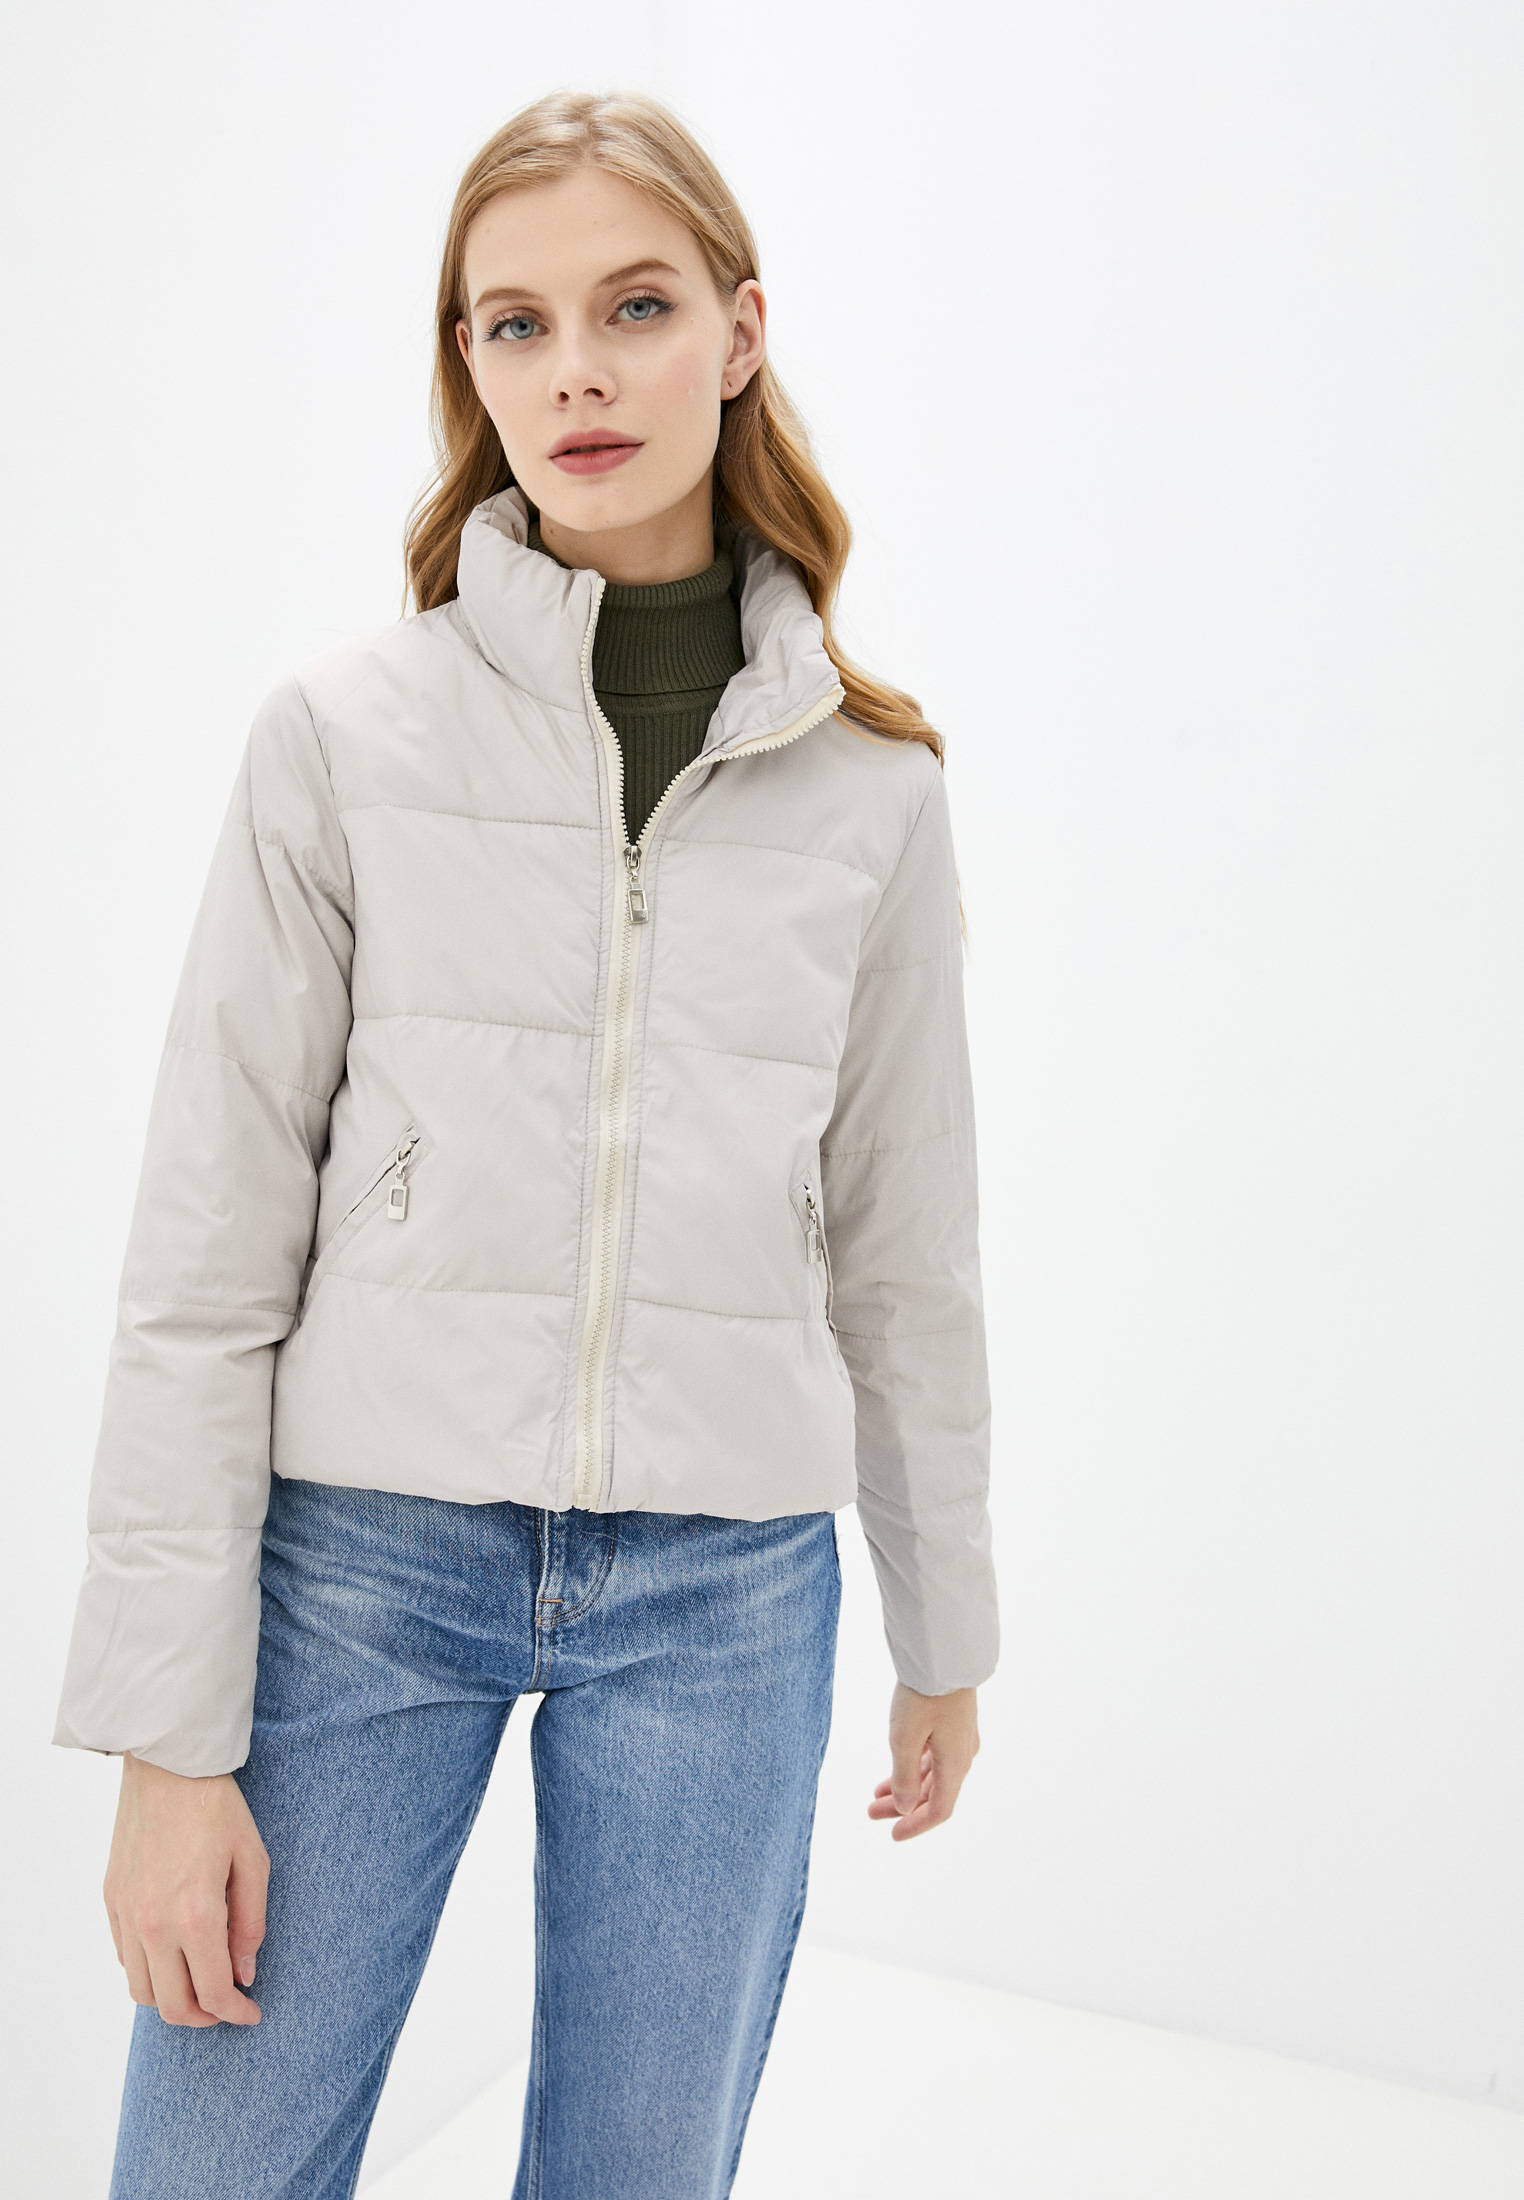 Утепленная куртка Aaquamarina Куртка утепленная Aaquamarina